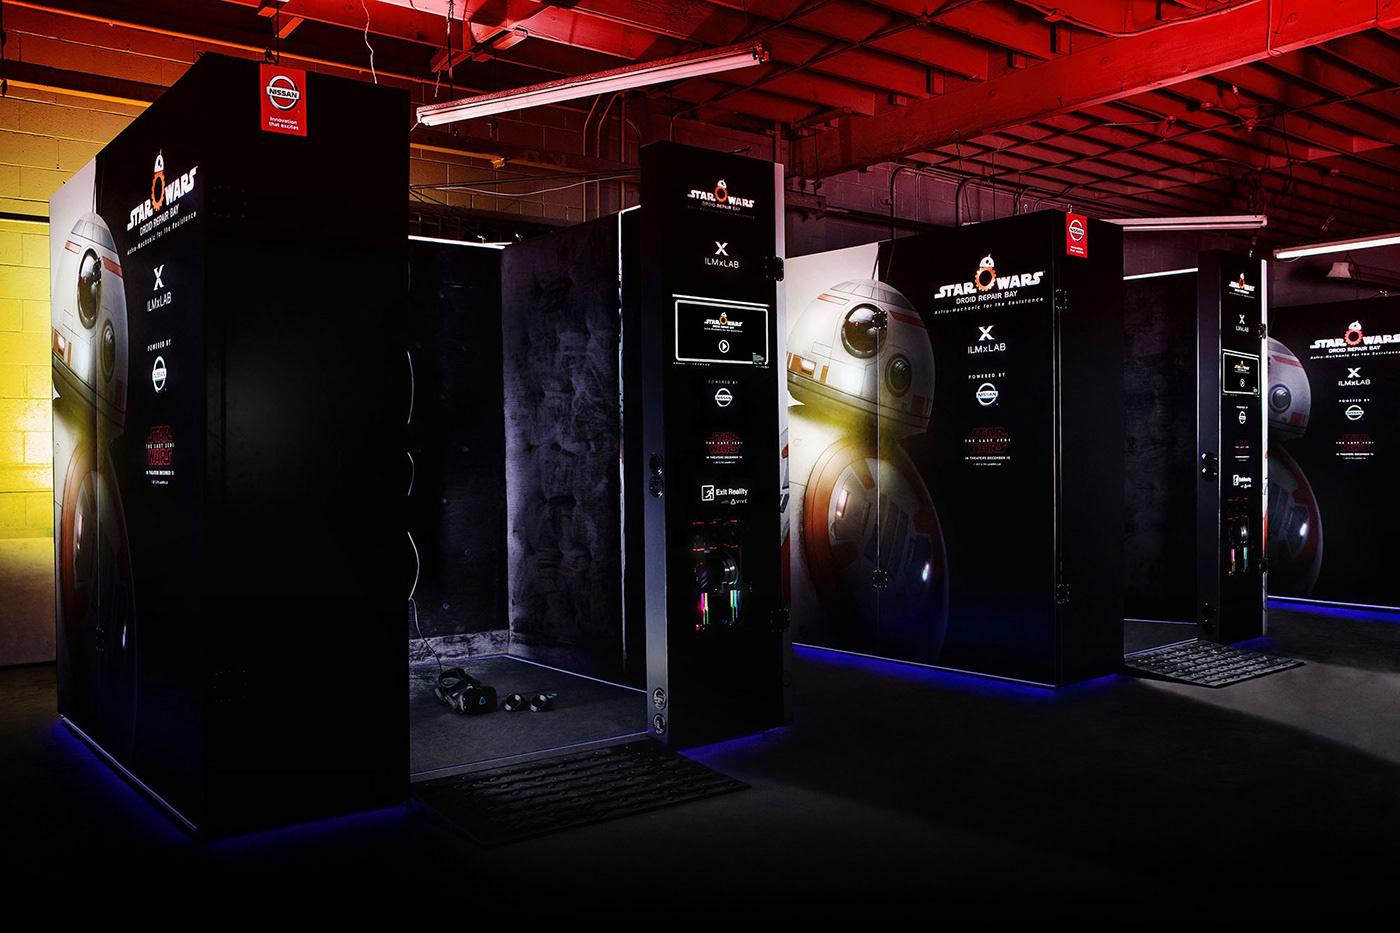 3D AR disney Gaming iMAX star wars Startup vr